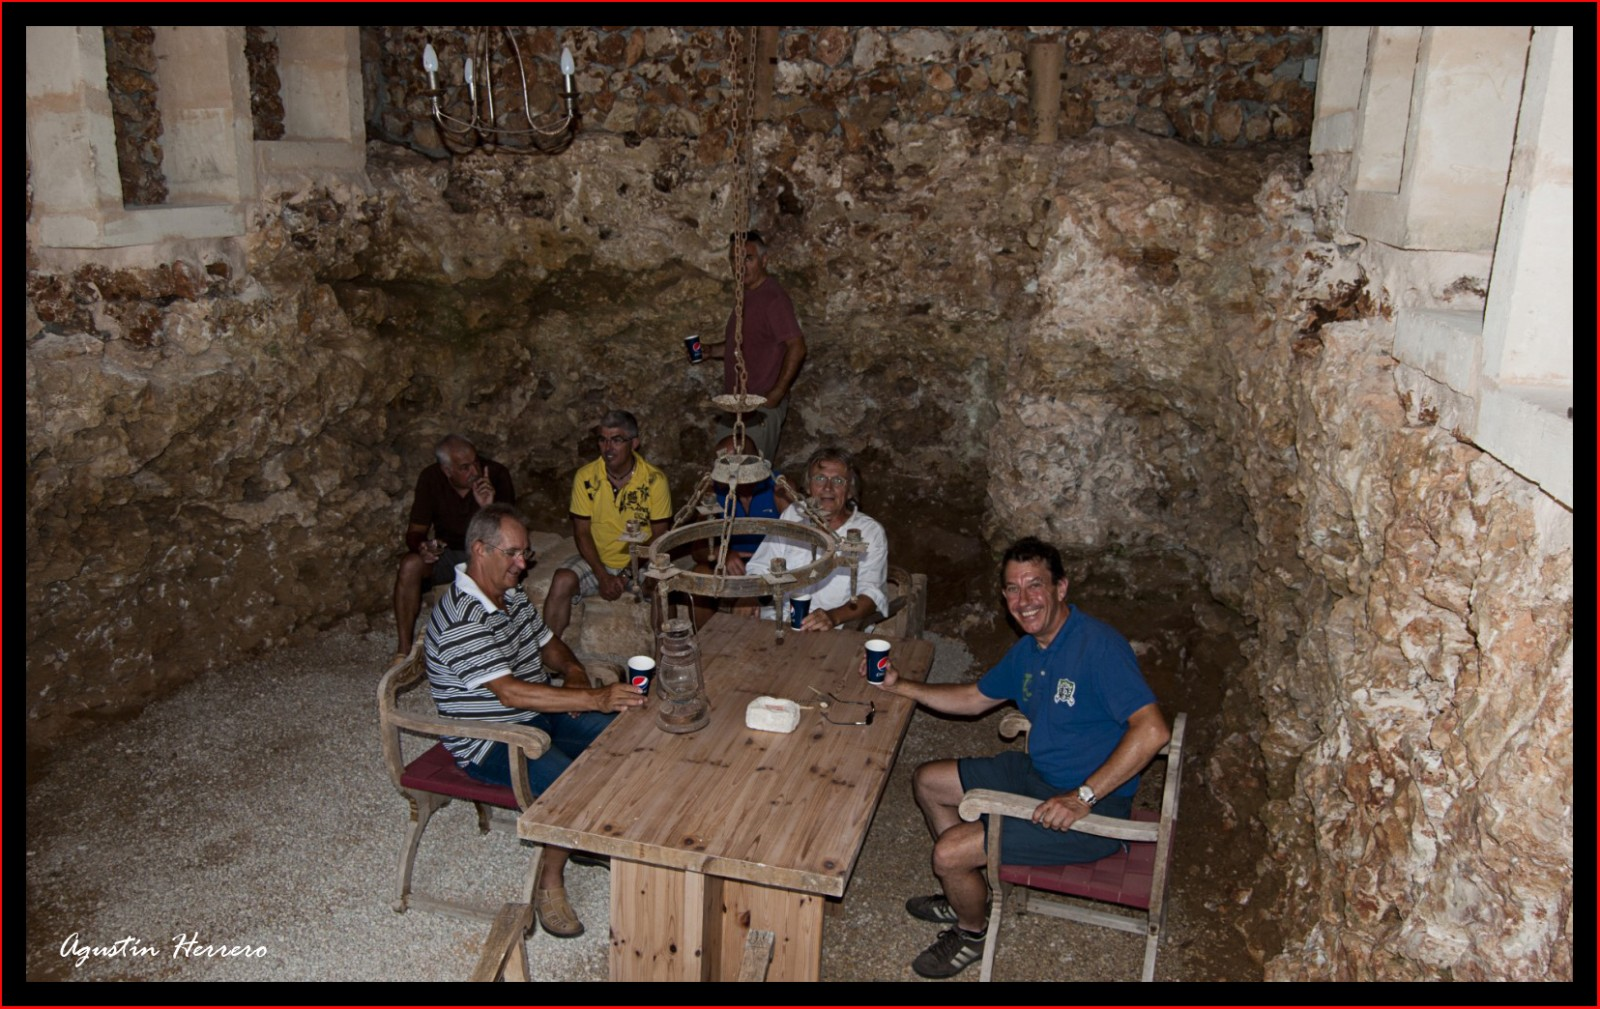 2011-07-17-ludwic-house-3